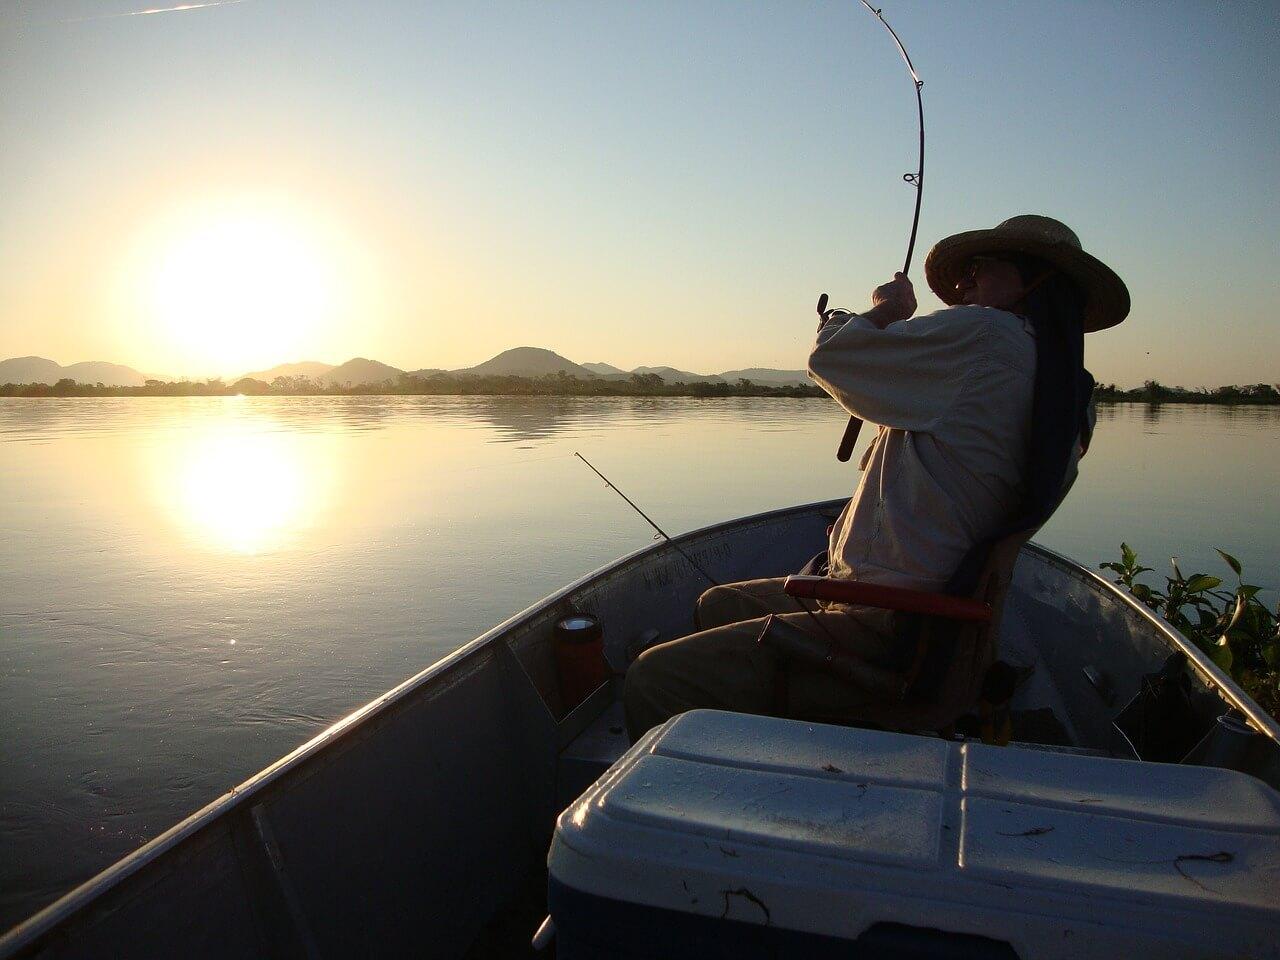 lugares para pescar - Pantanal